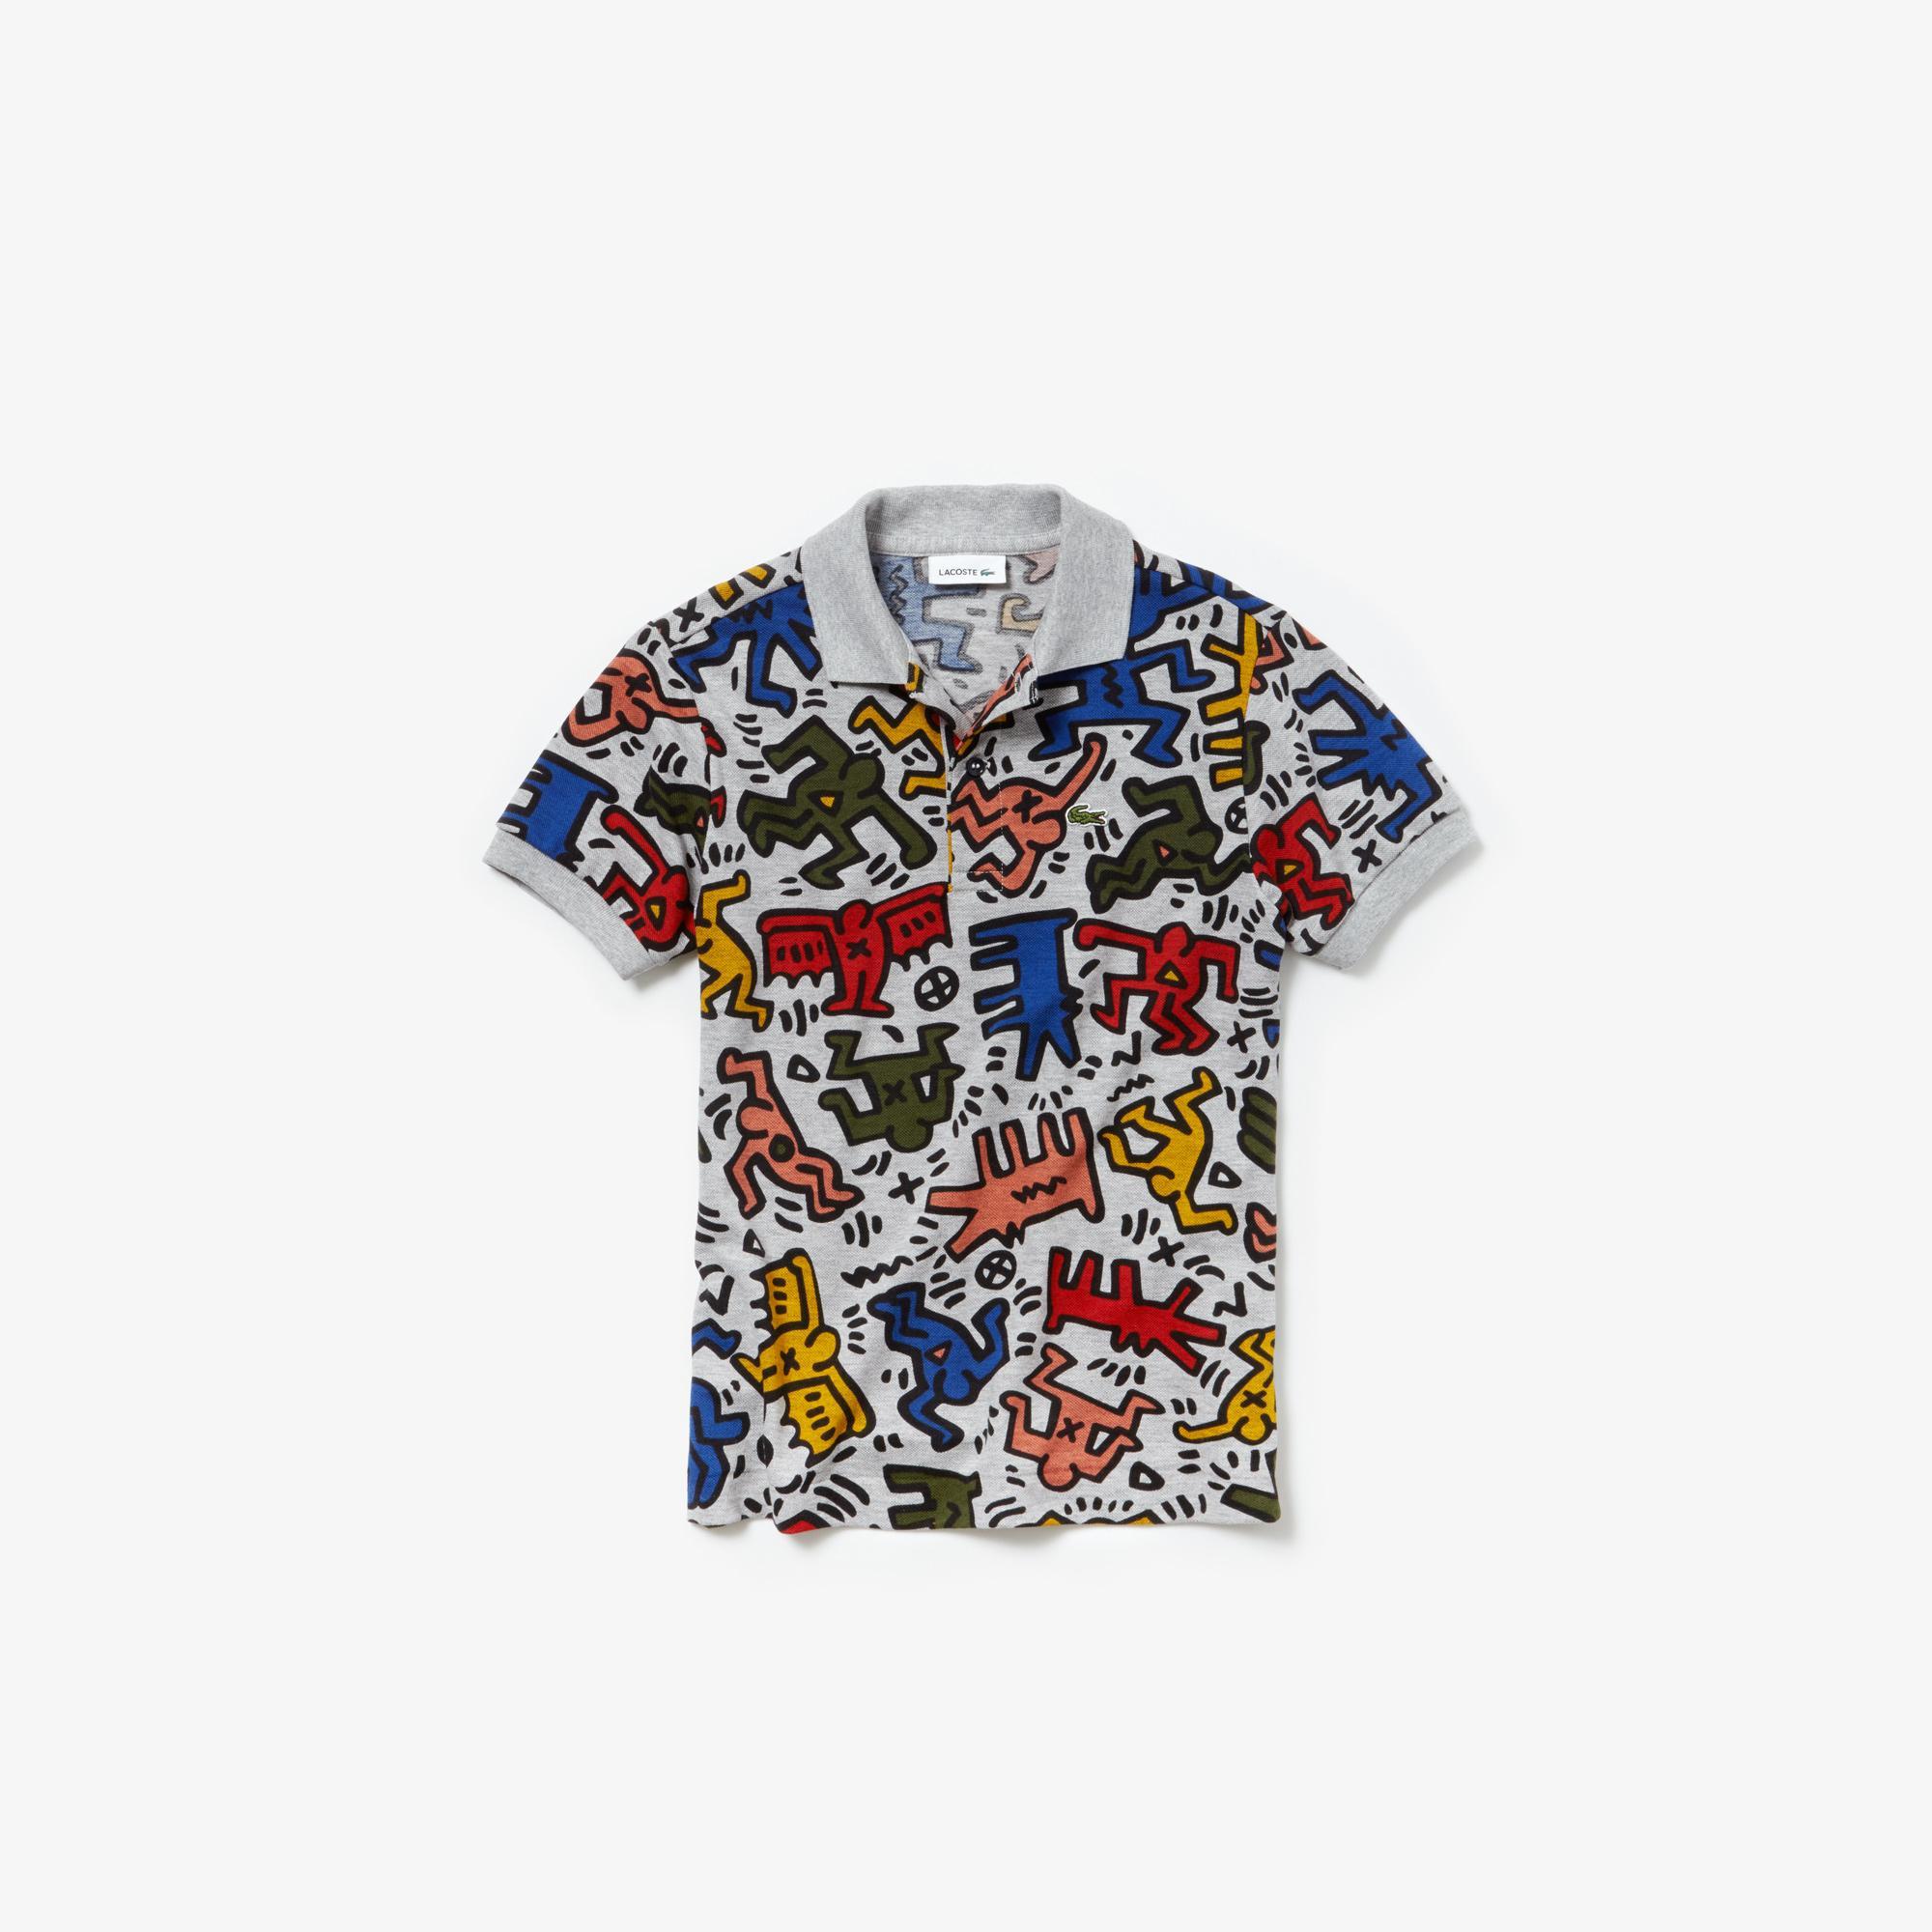 Lacoste Kids' Keith Haring Print Mini Piqué Polo